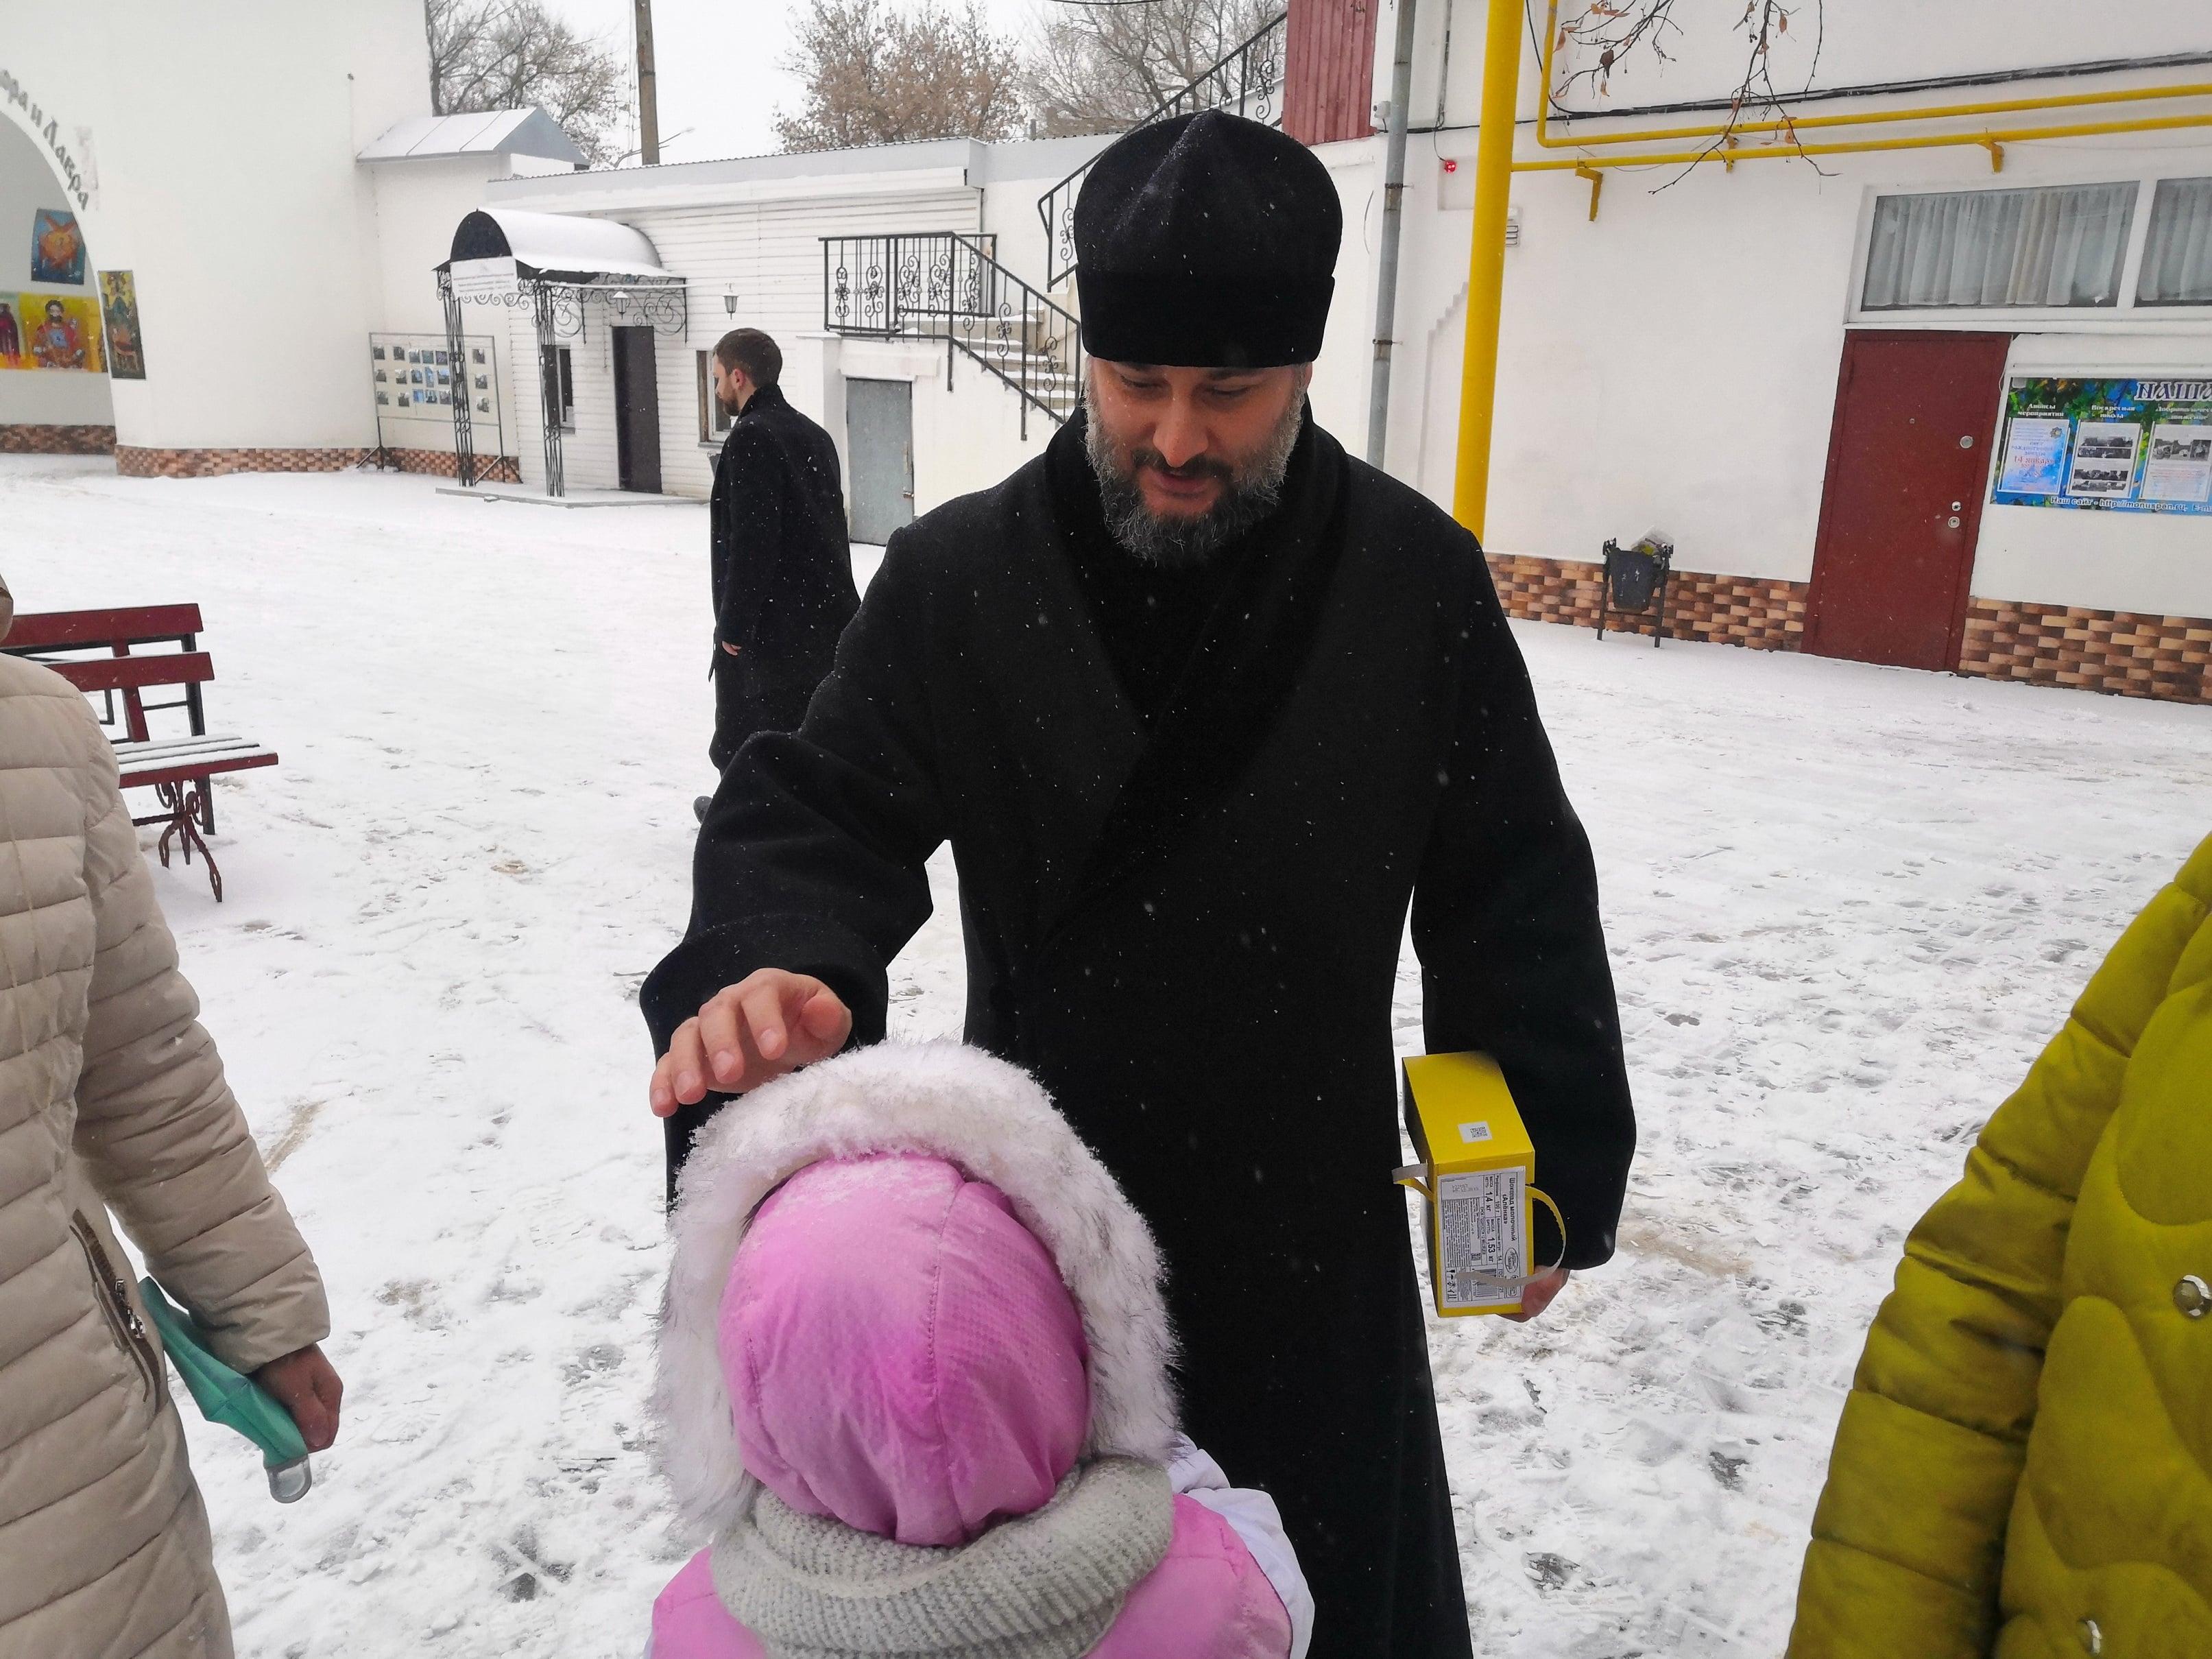 http://monuspen.ru/photoreports/b3aa9199fb88f725c81fb67701ac2fg1.jpg